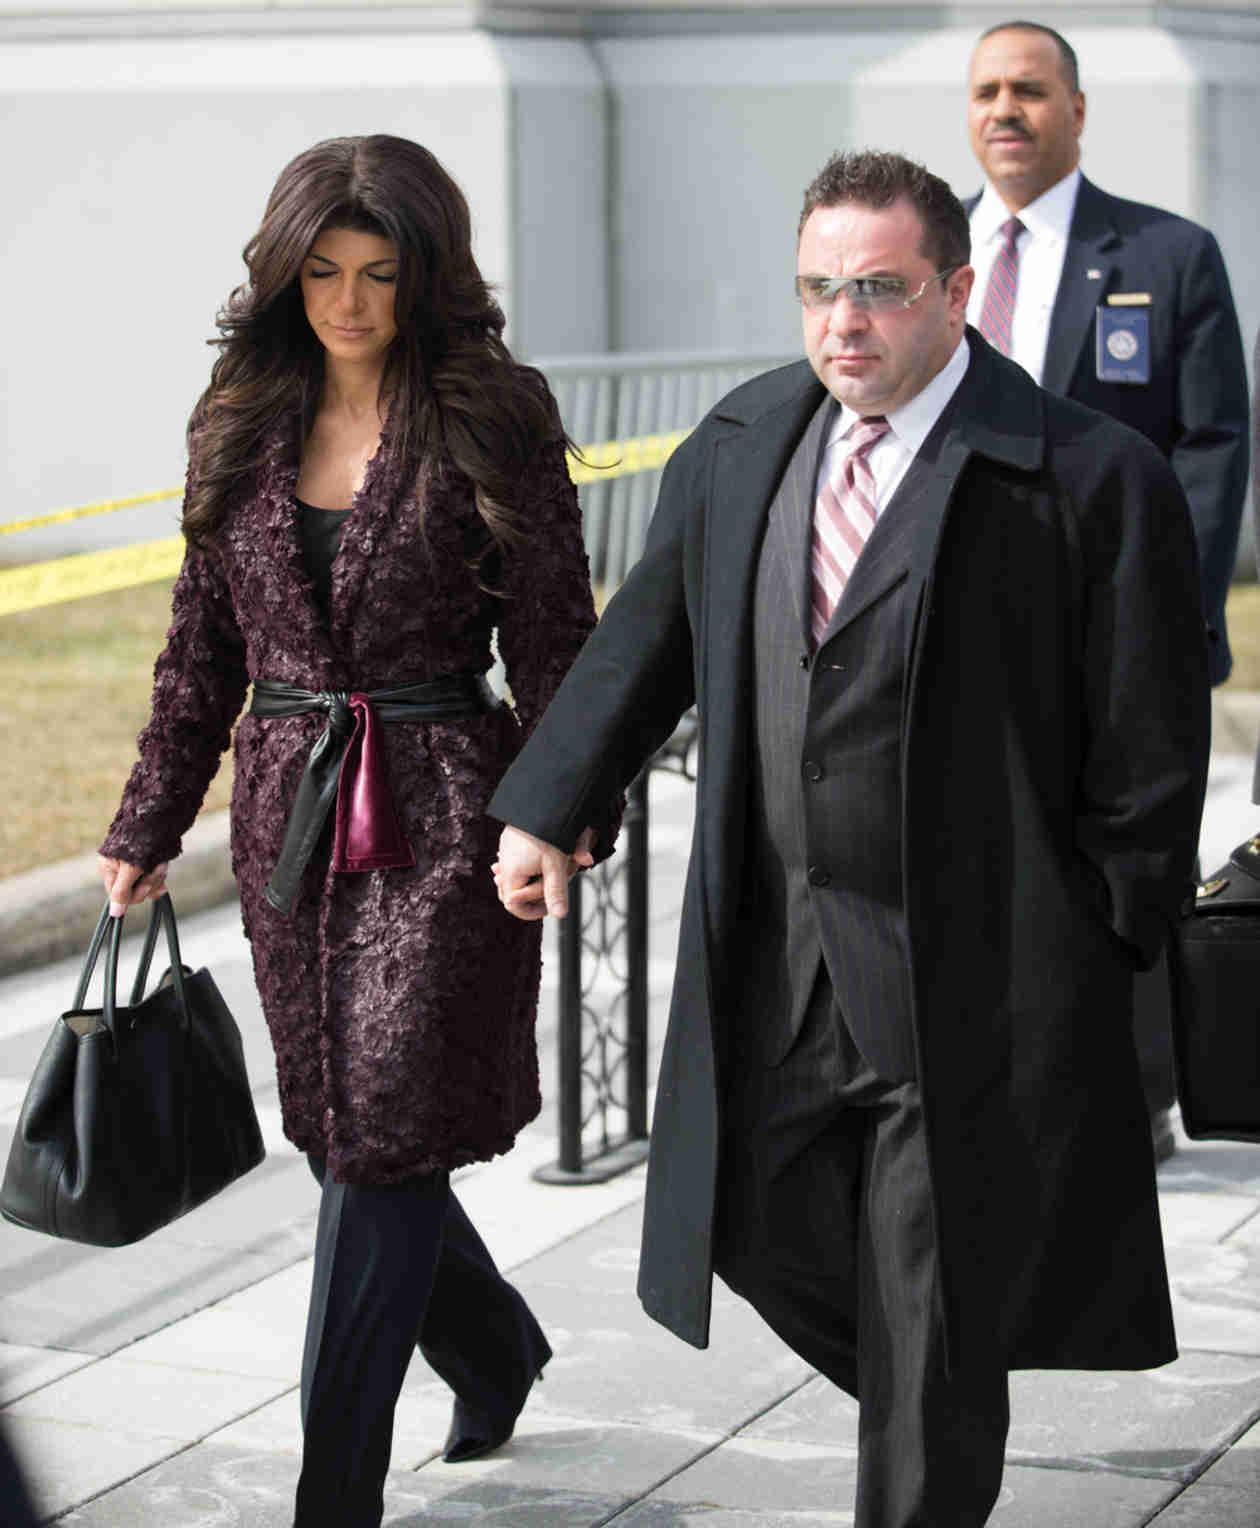 Teresa and Joe Giudice Plead Guilty to Fraud Charges (VIDEO)